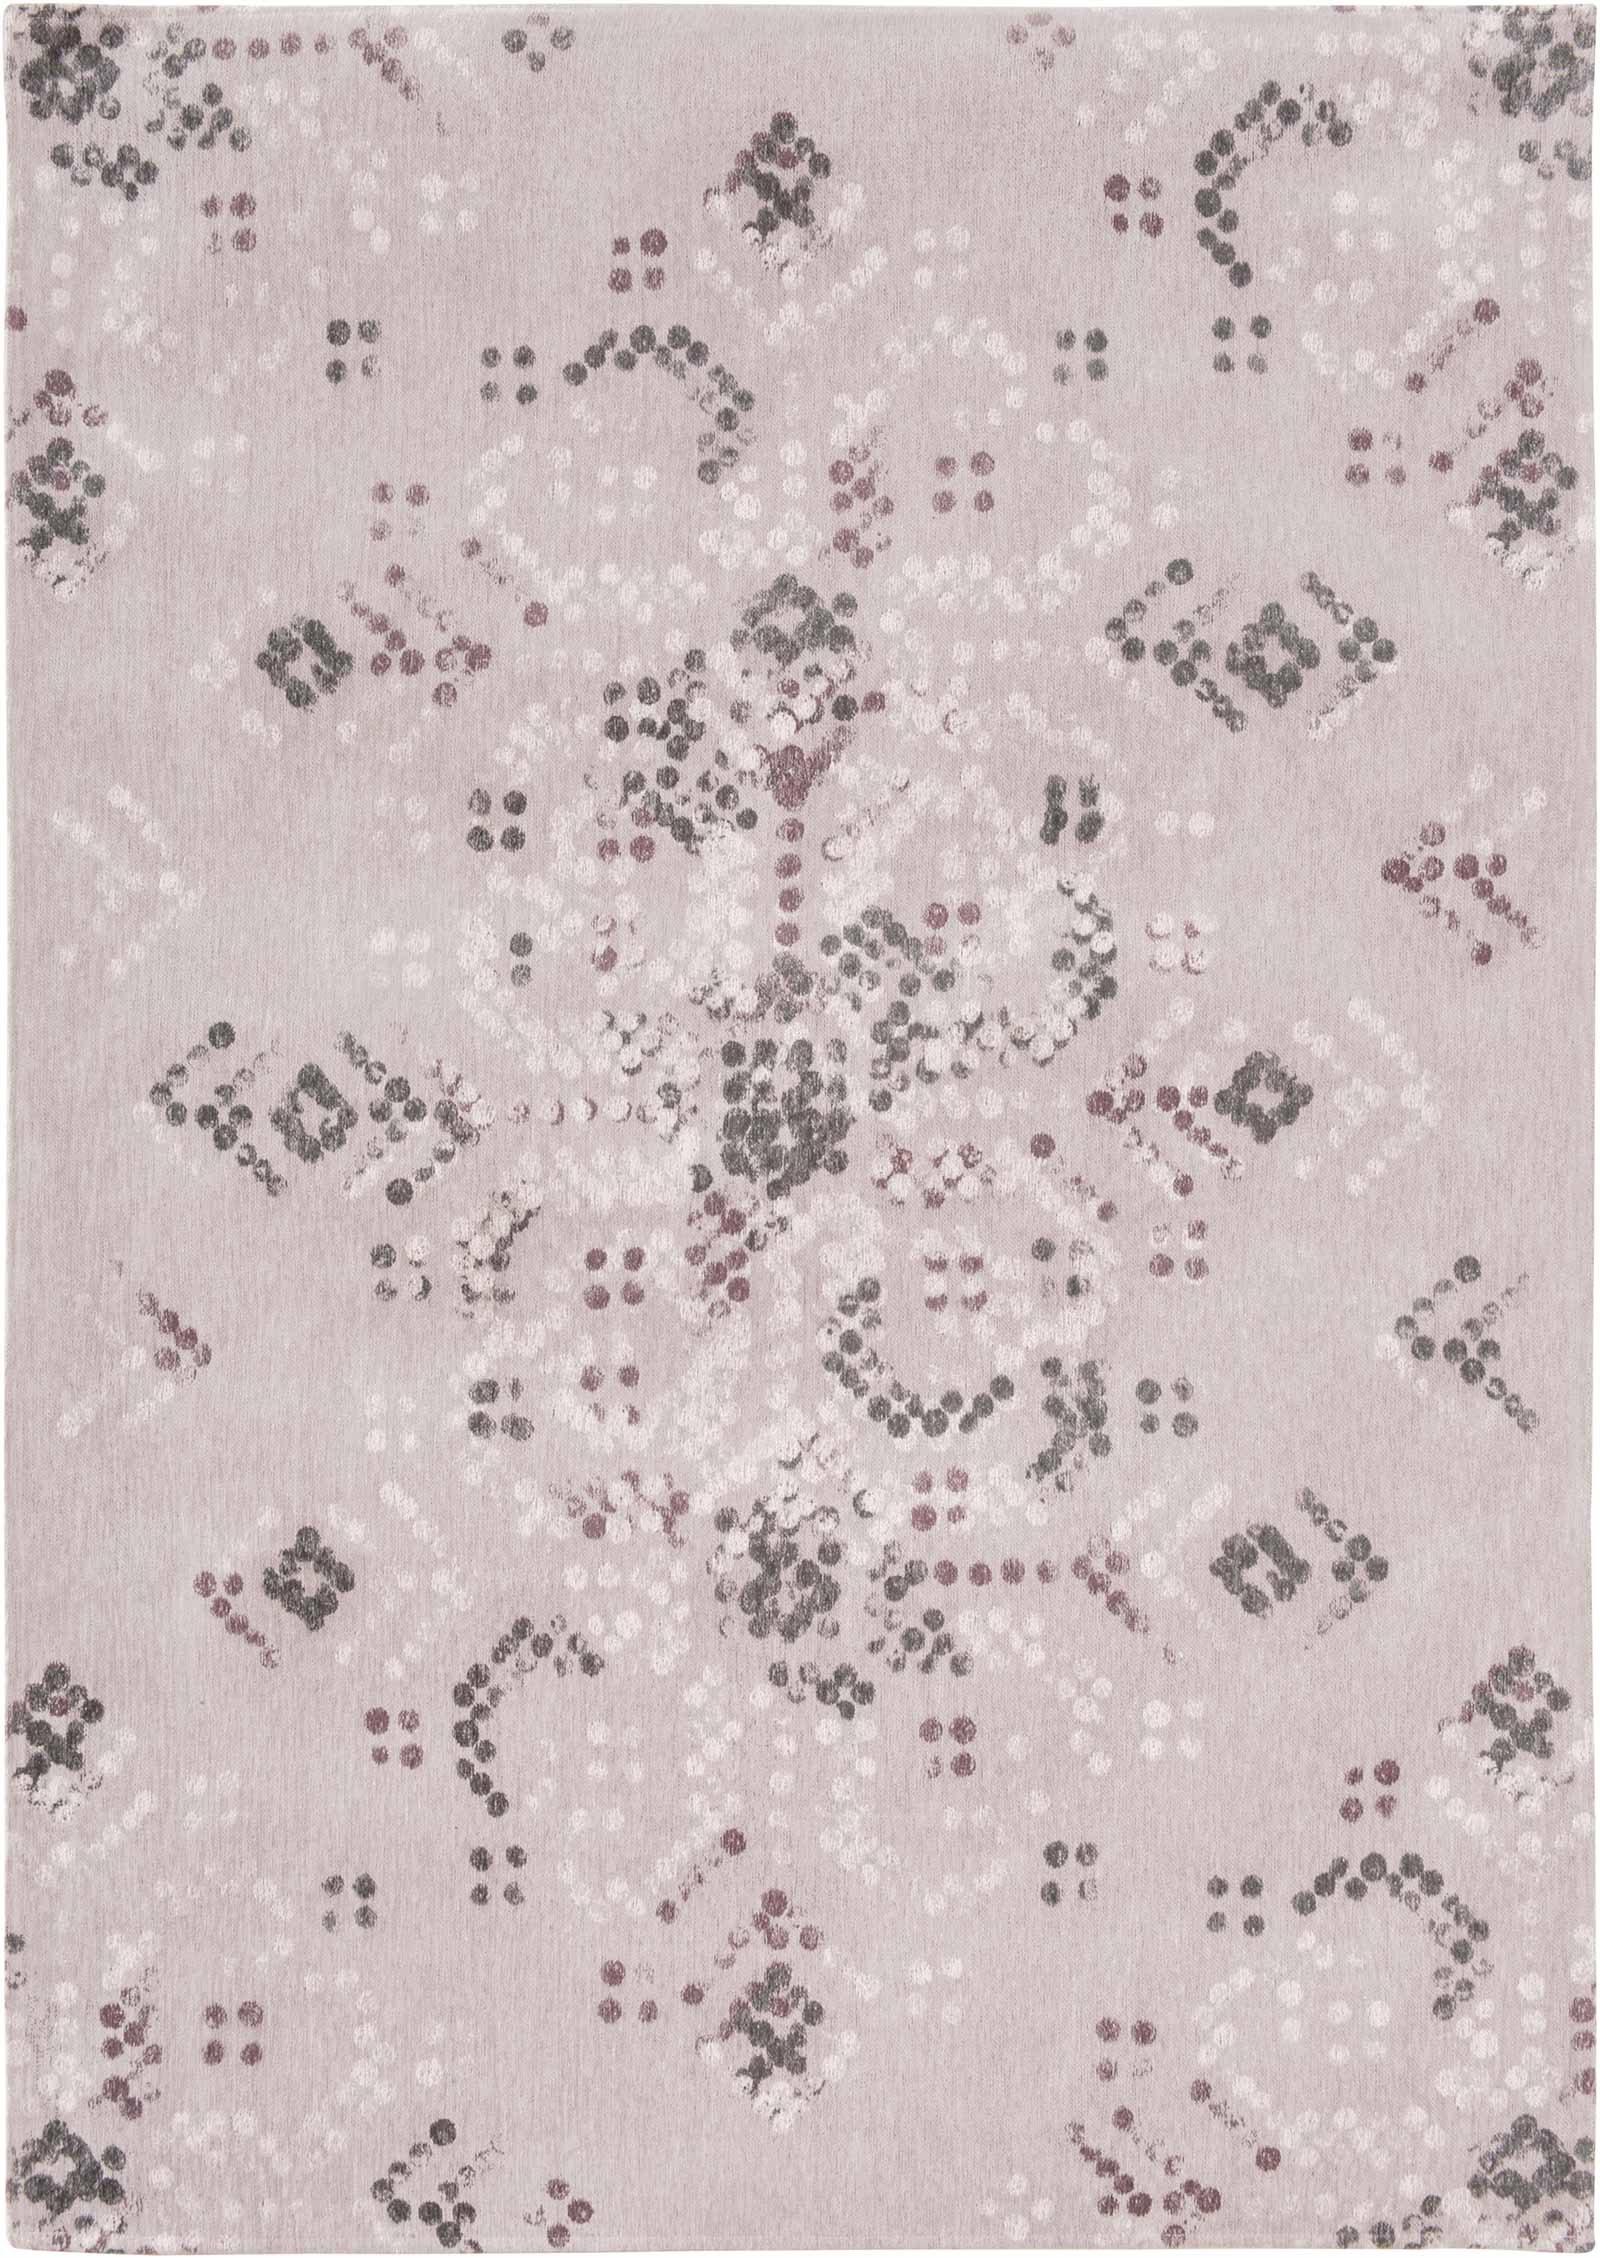 Louis De Poortere rugs Villa Nova LX 8760 Marit Bramble